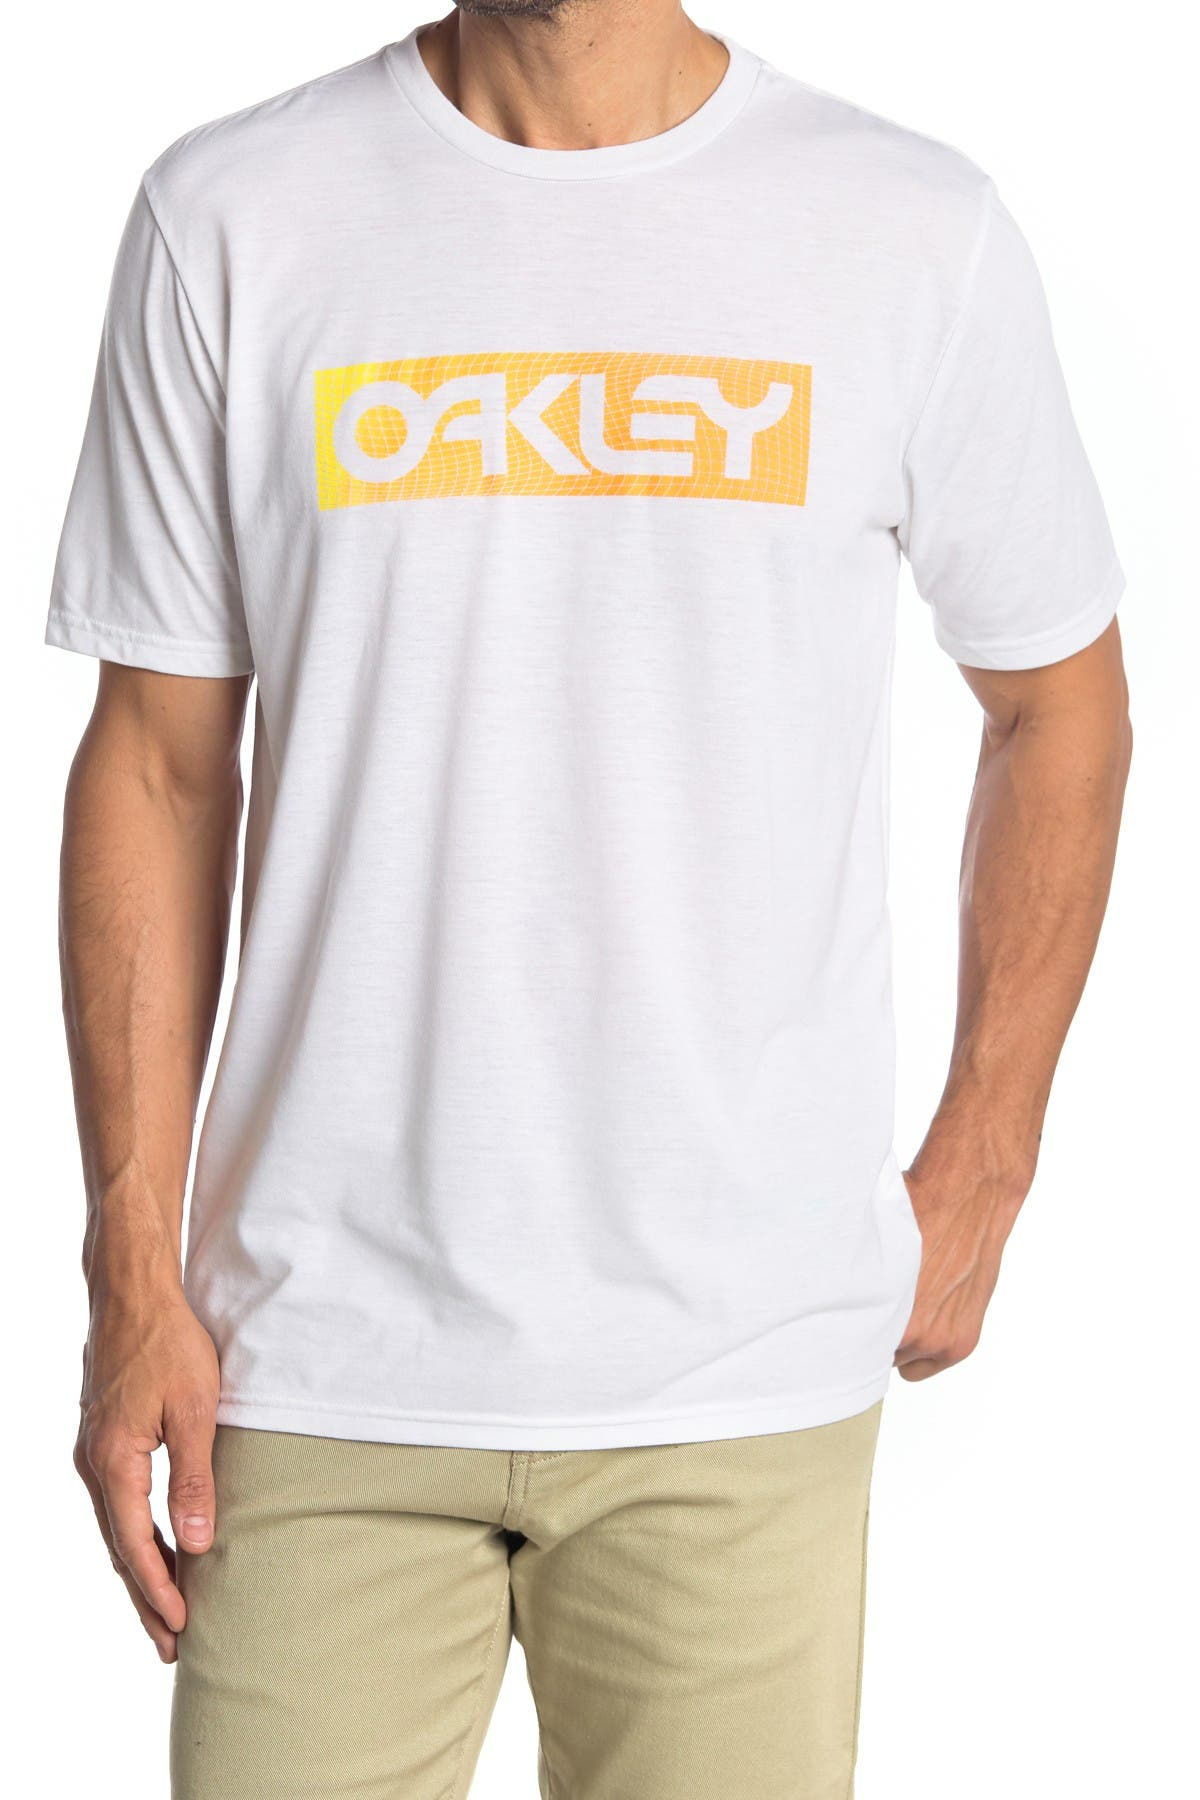 Image of Oakley B1B Logo T-Shirt